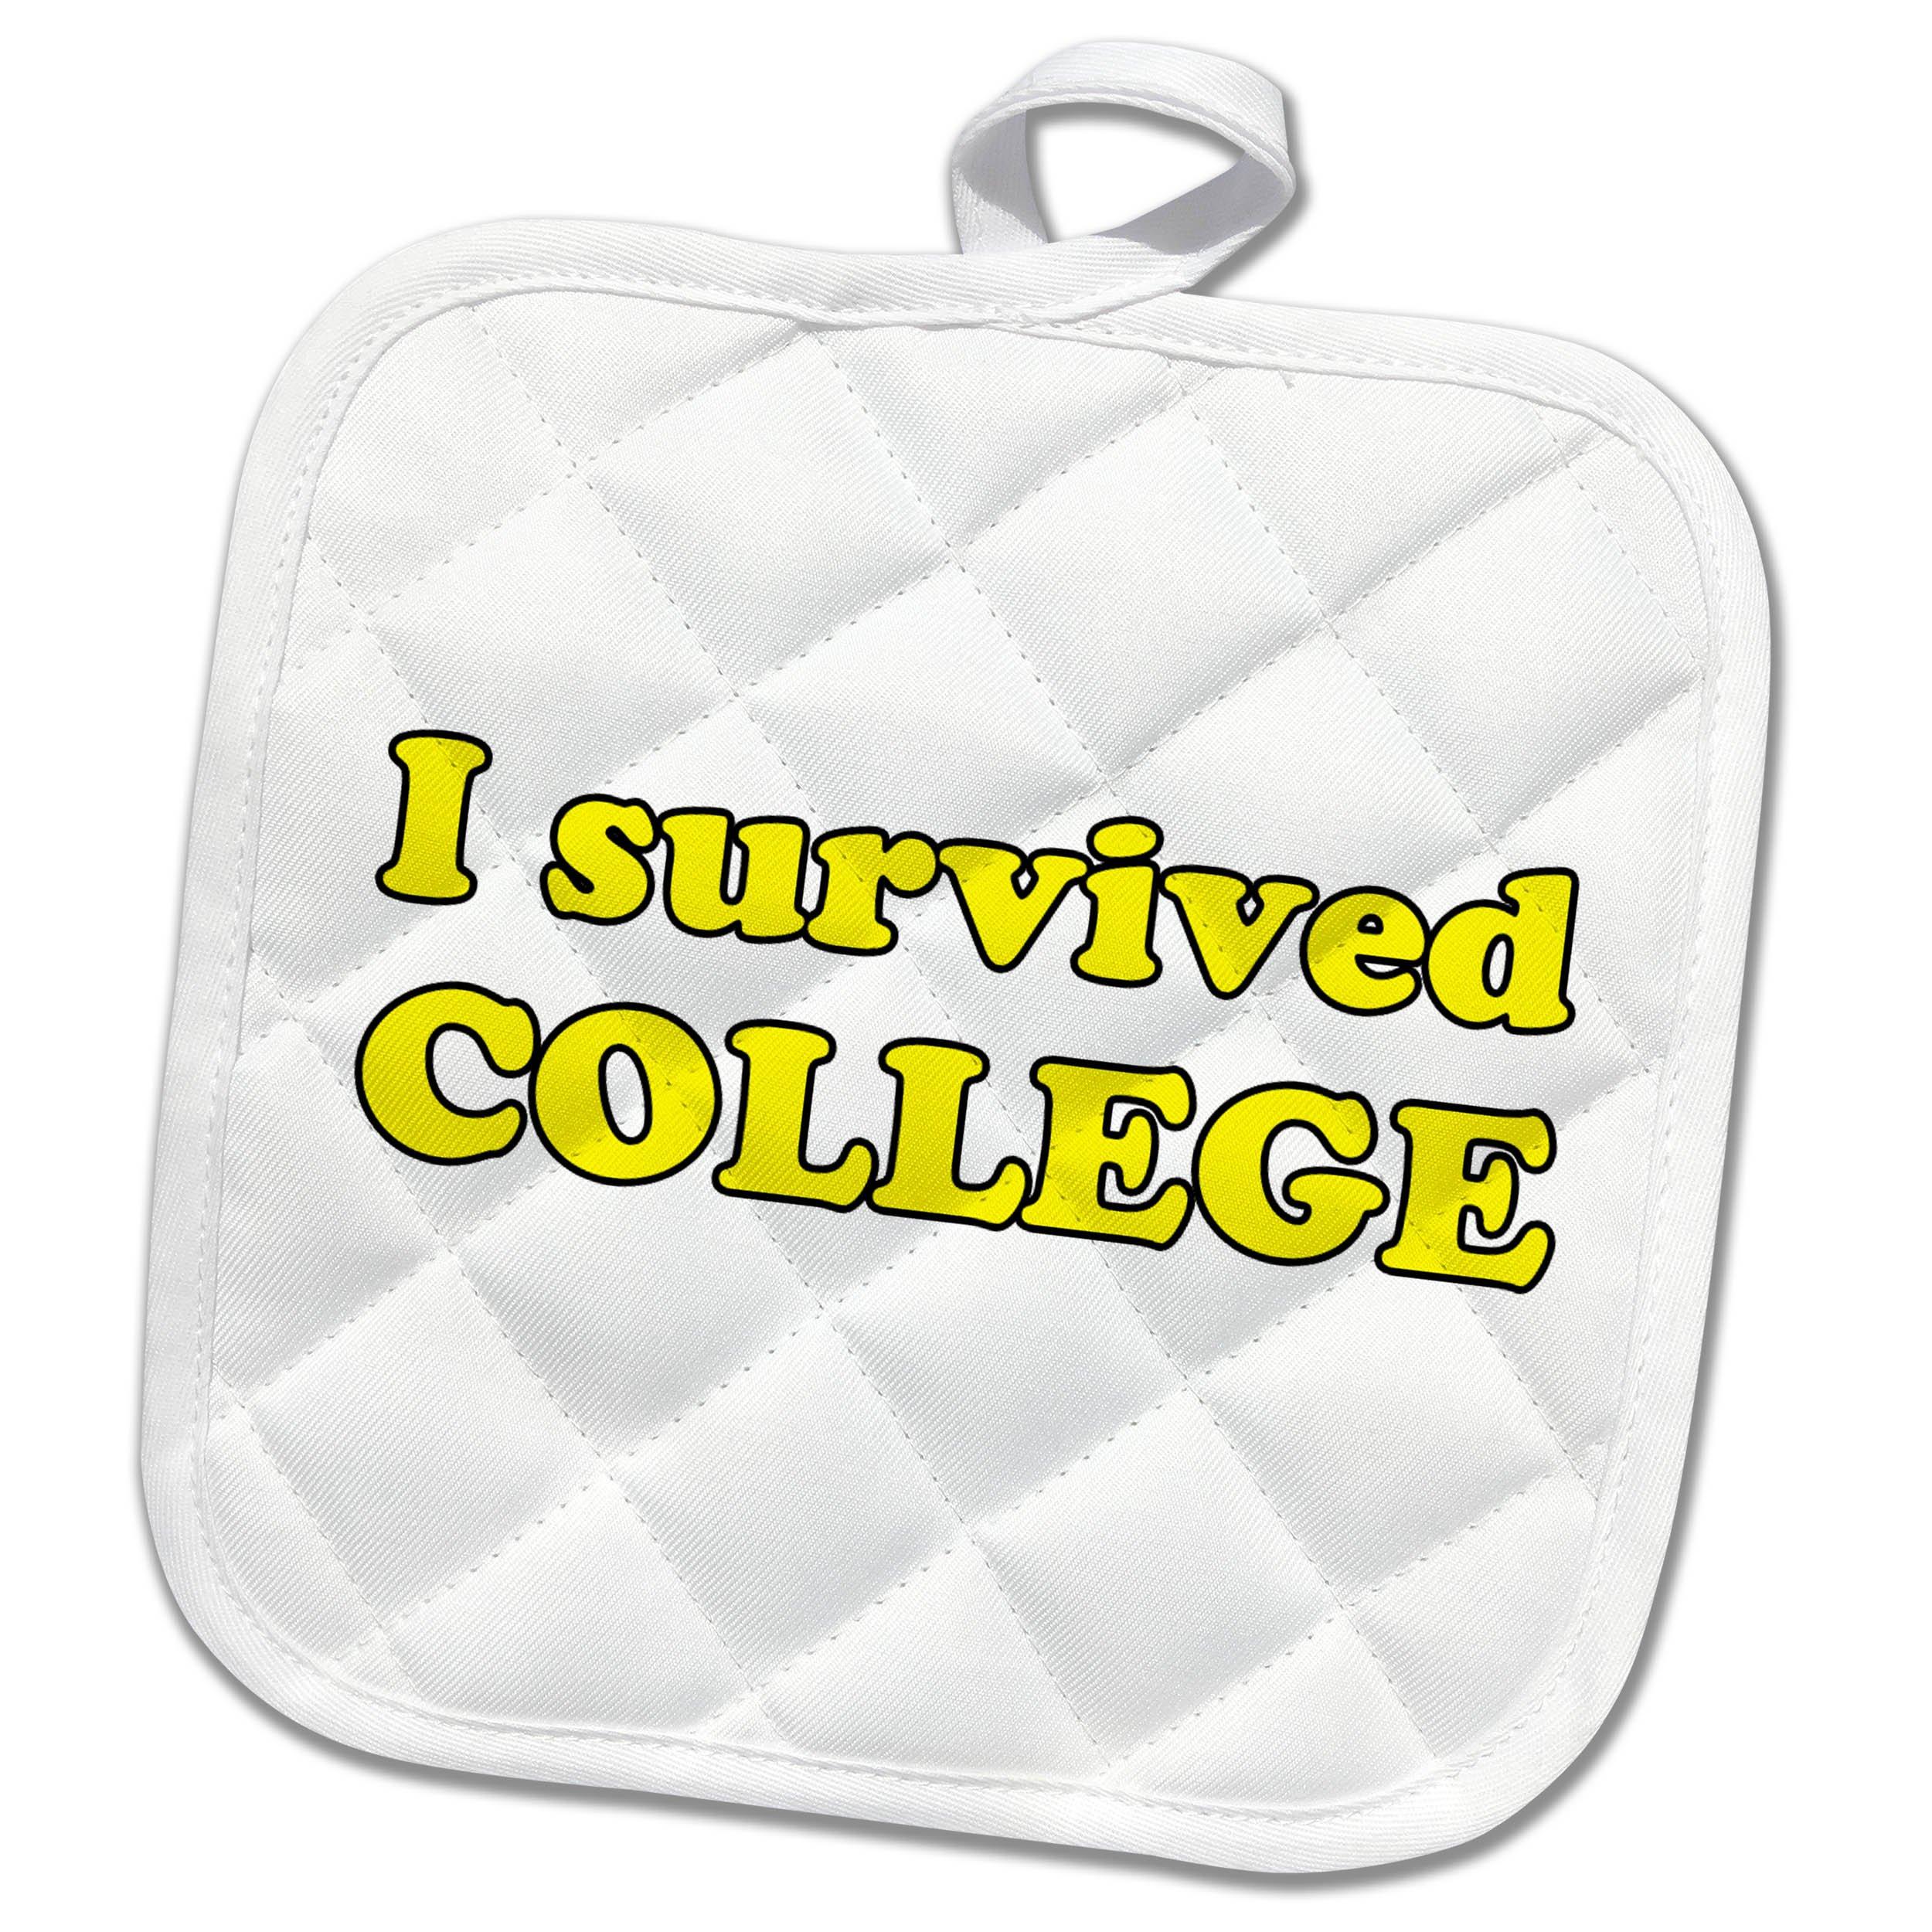 3dRose Student Humor - I Survived College Yellow - 8x8 Potholder (phl_274510_1)